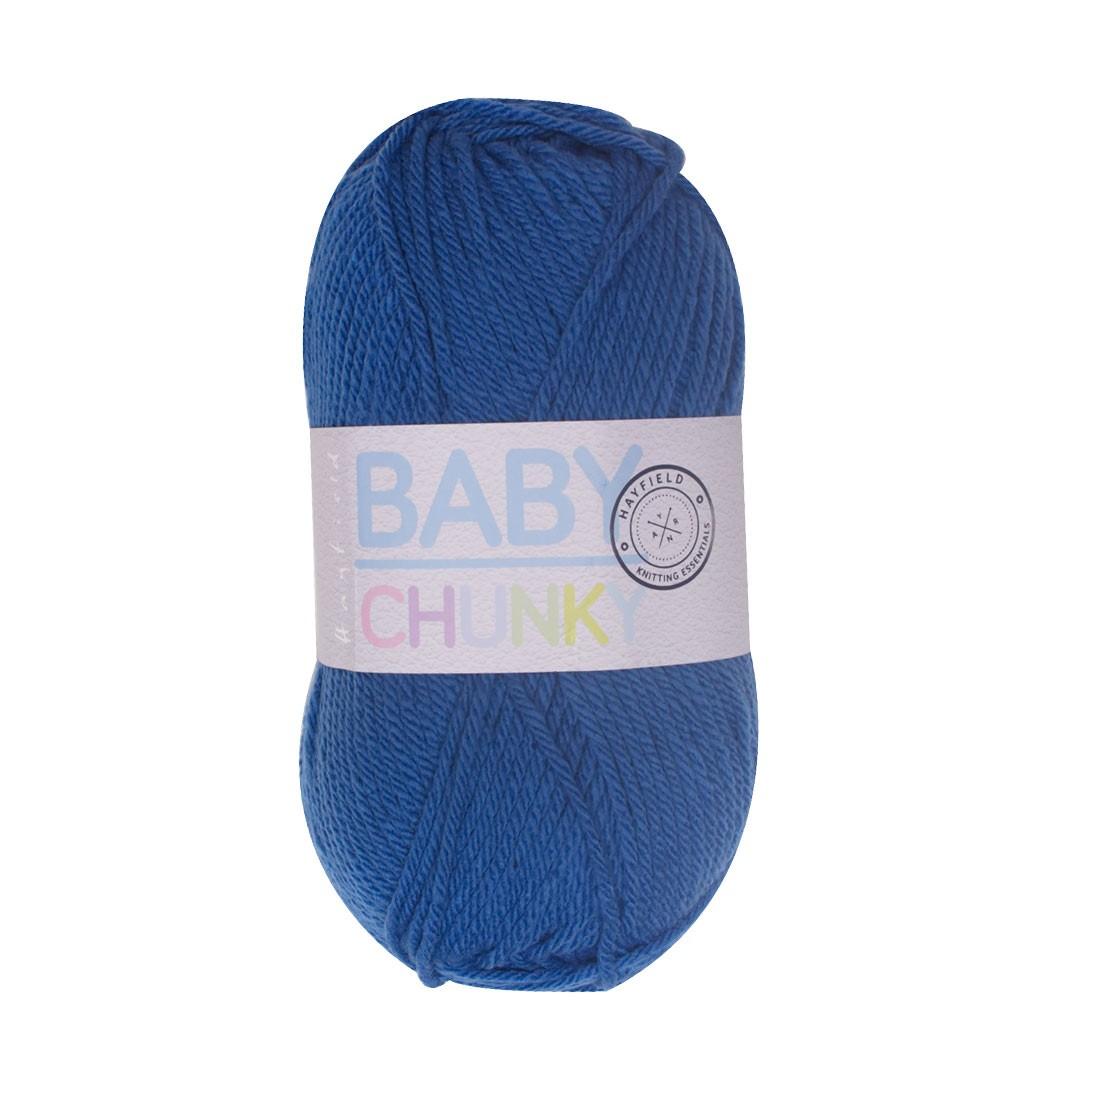 Hayfield Baby Chunky Wool - Brook Blue Yarn 403